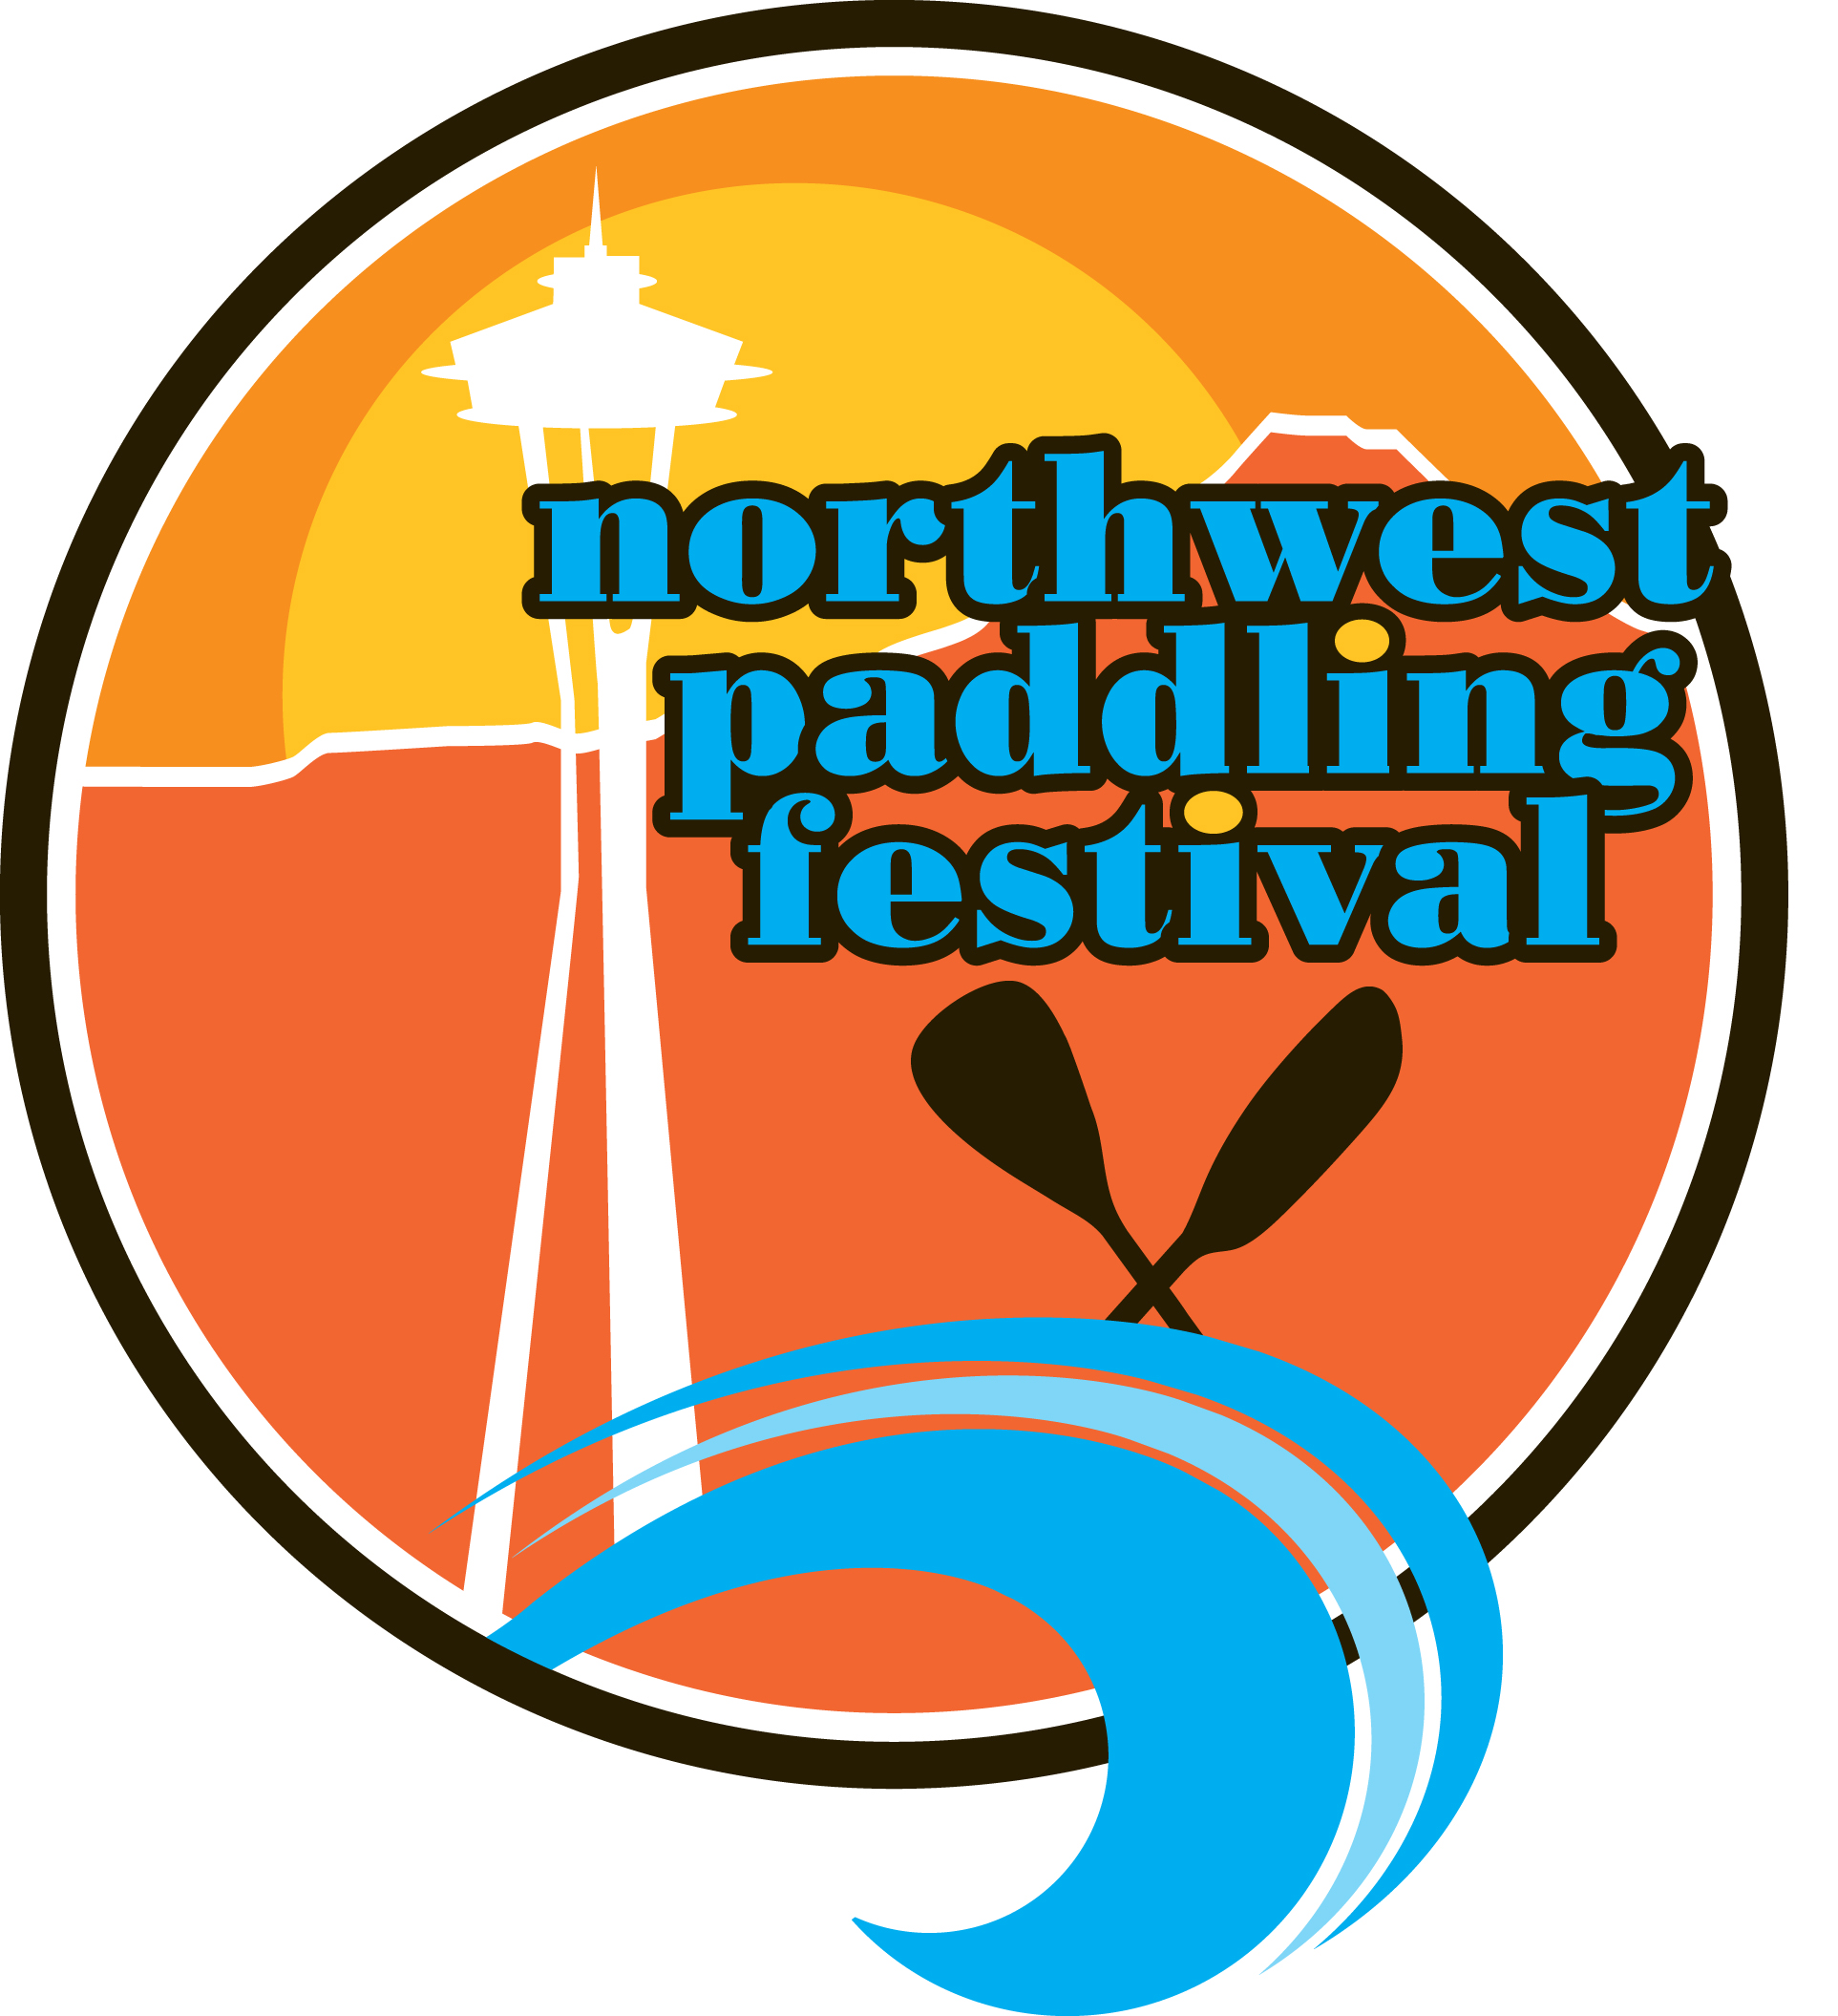 NW Paddling Festival Logo